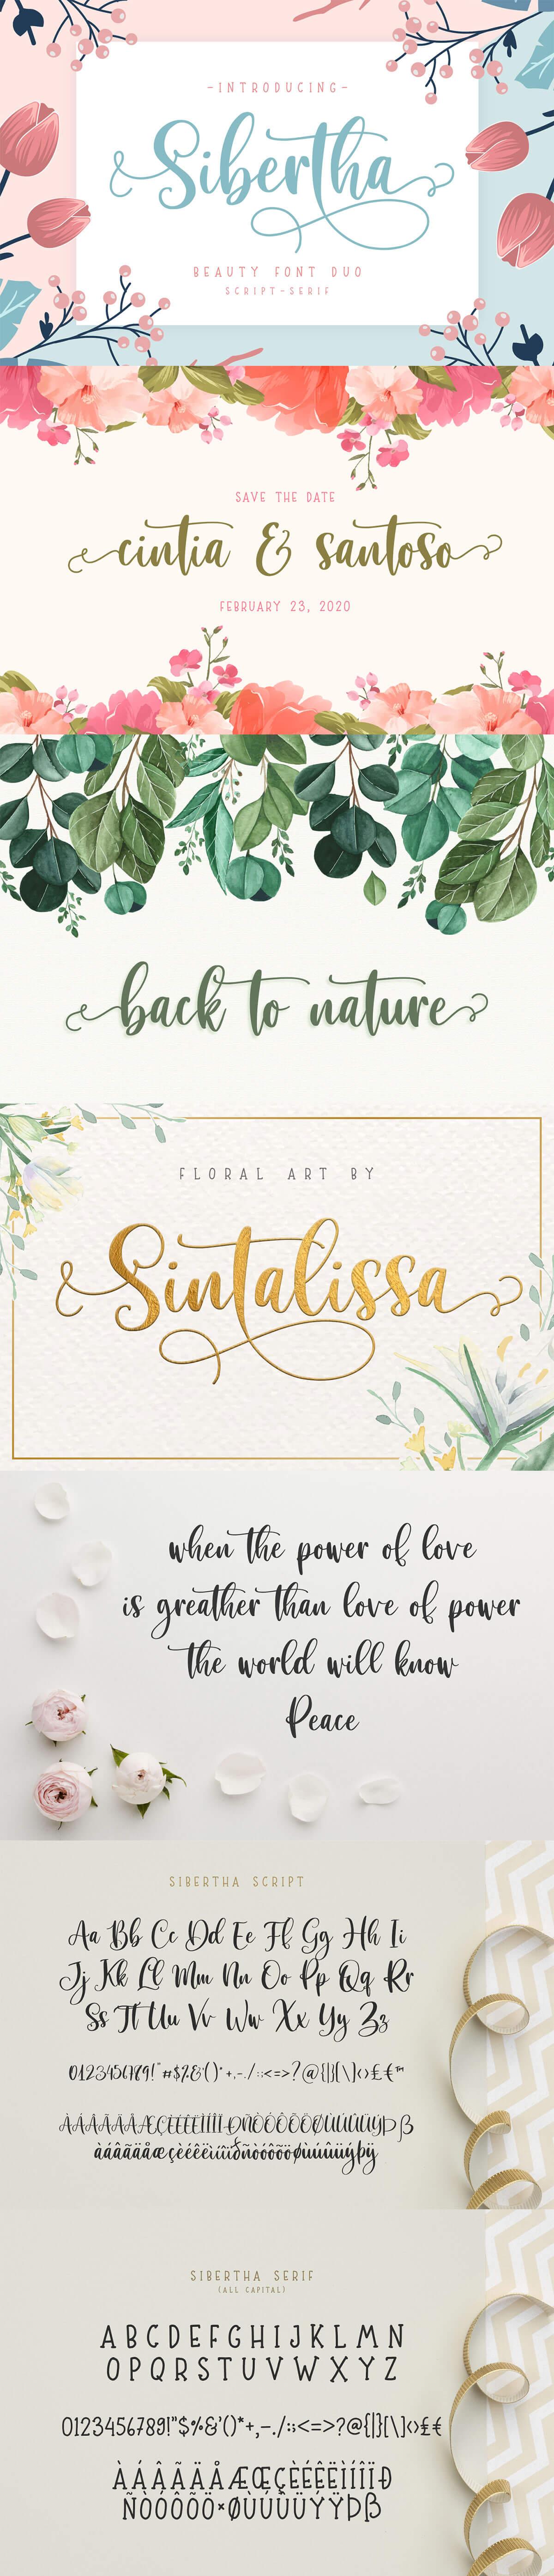 Free Sibertha Script Font